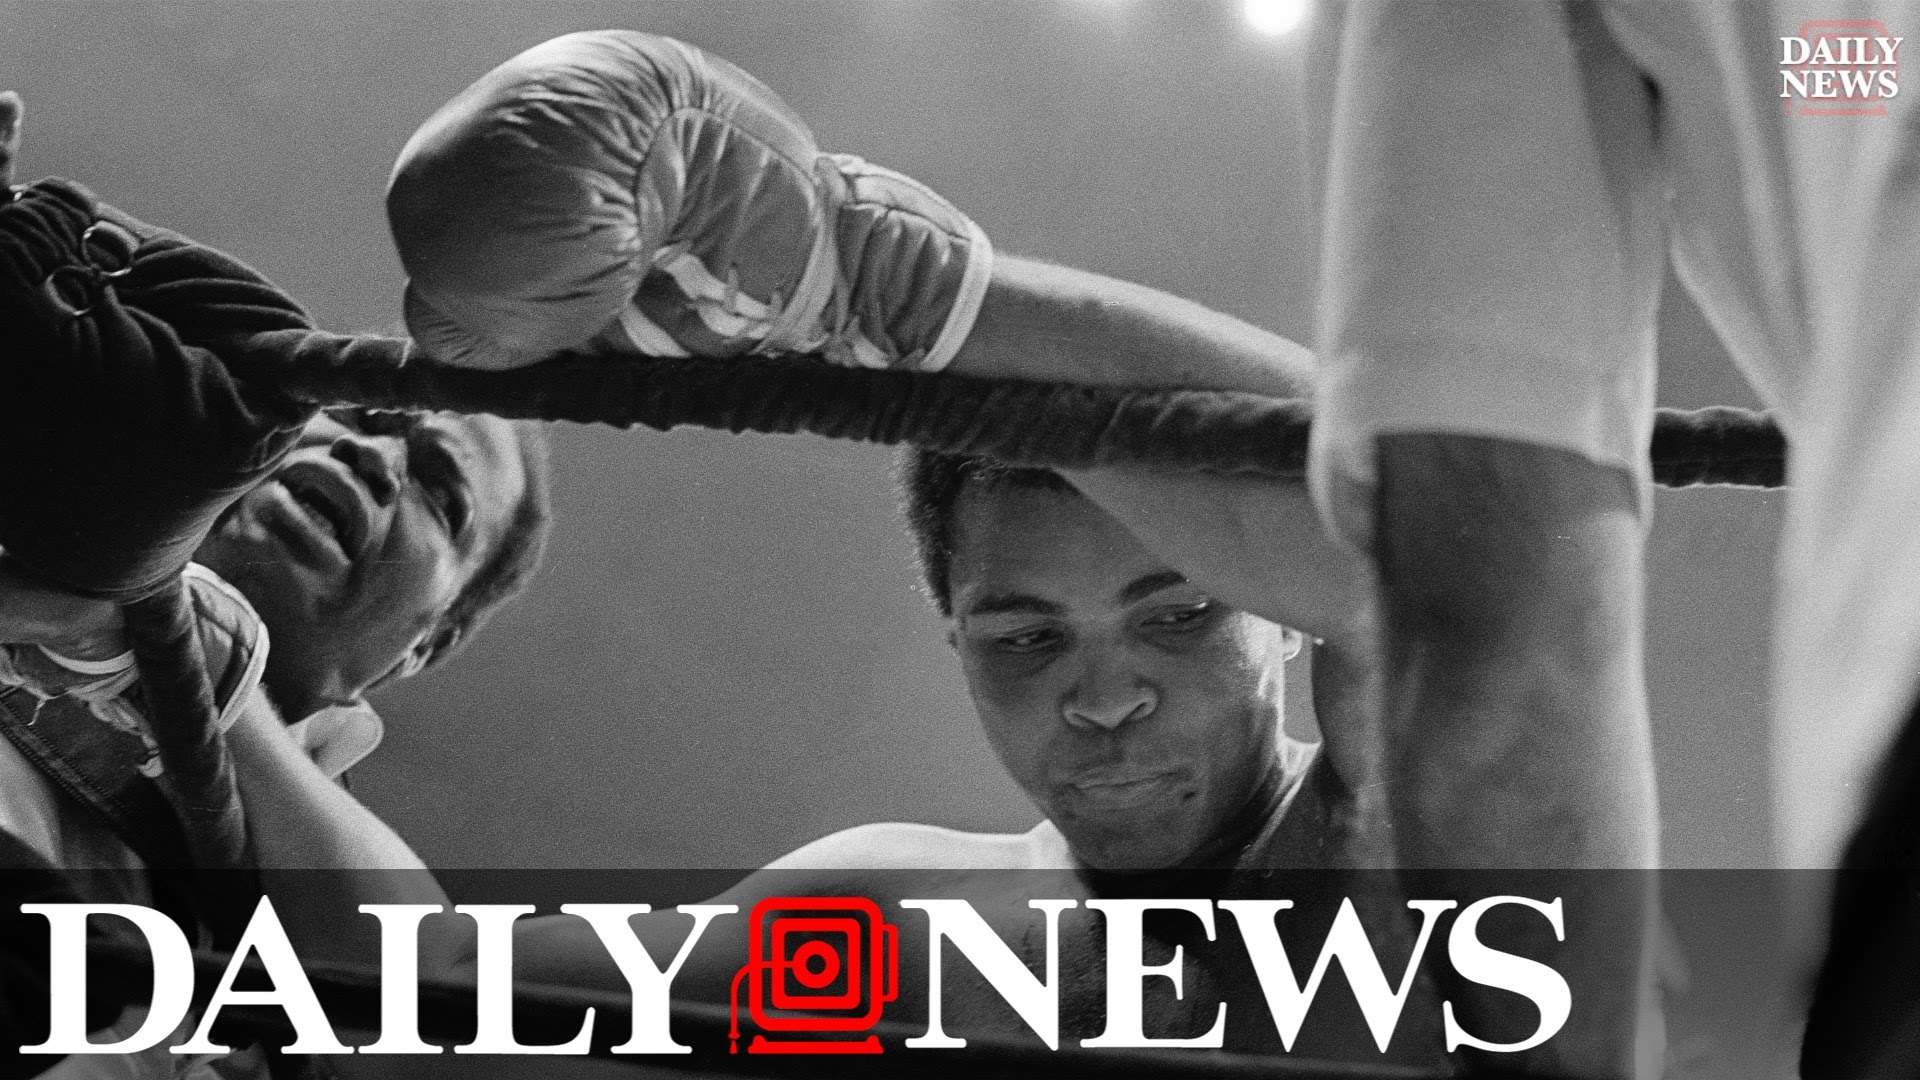 Muhammad Ali dies at age 74 in Scottsdale, Arizona